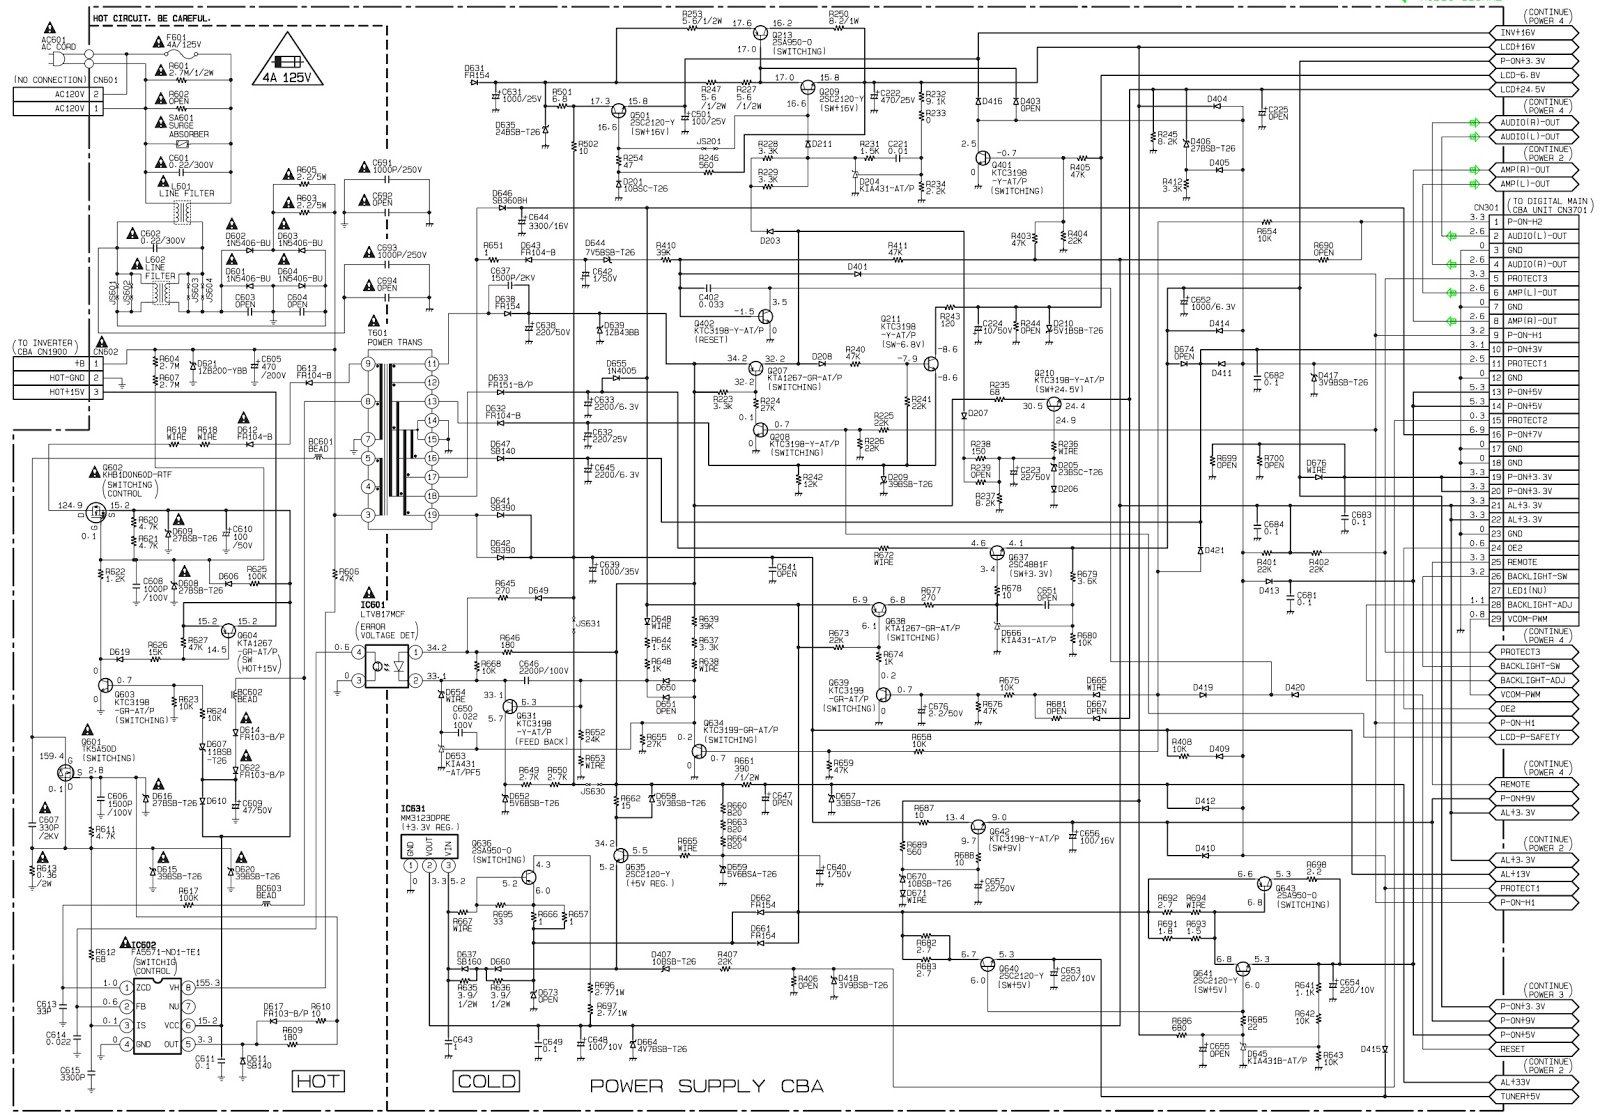 Master Electronics Repair !: PHILIPS 32PFL3505D/F7 (SERIAL